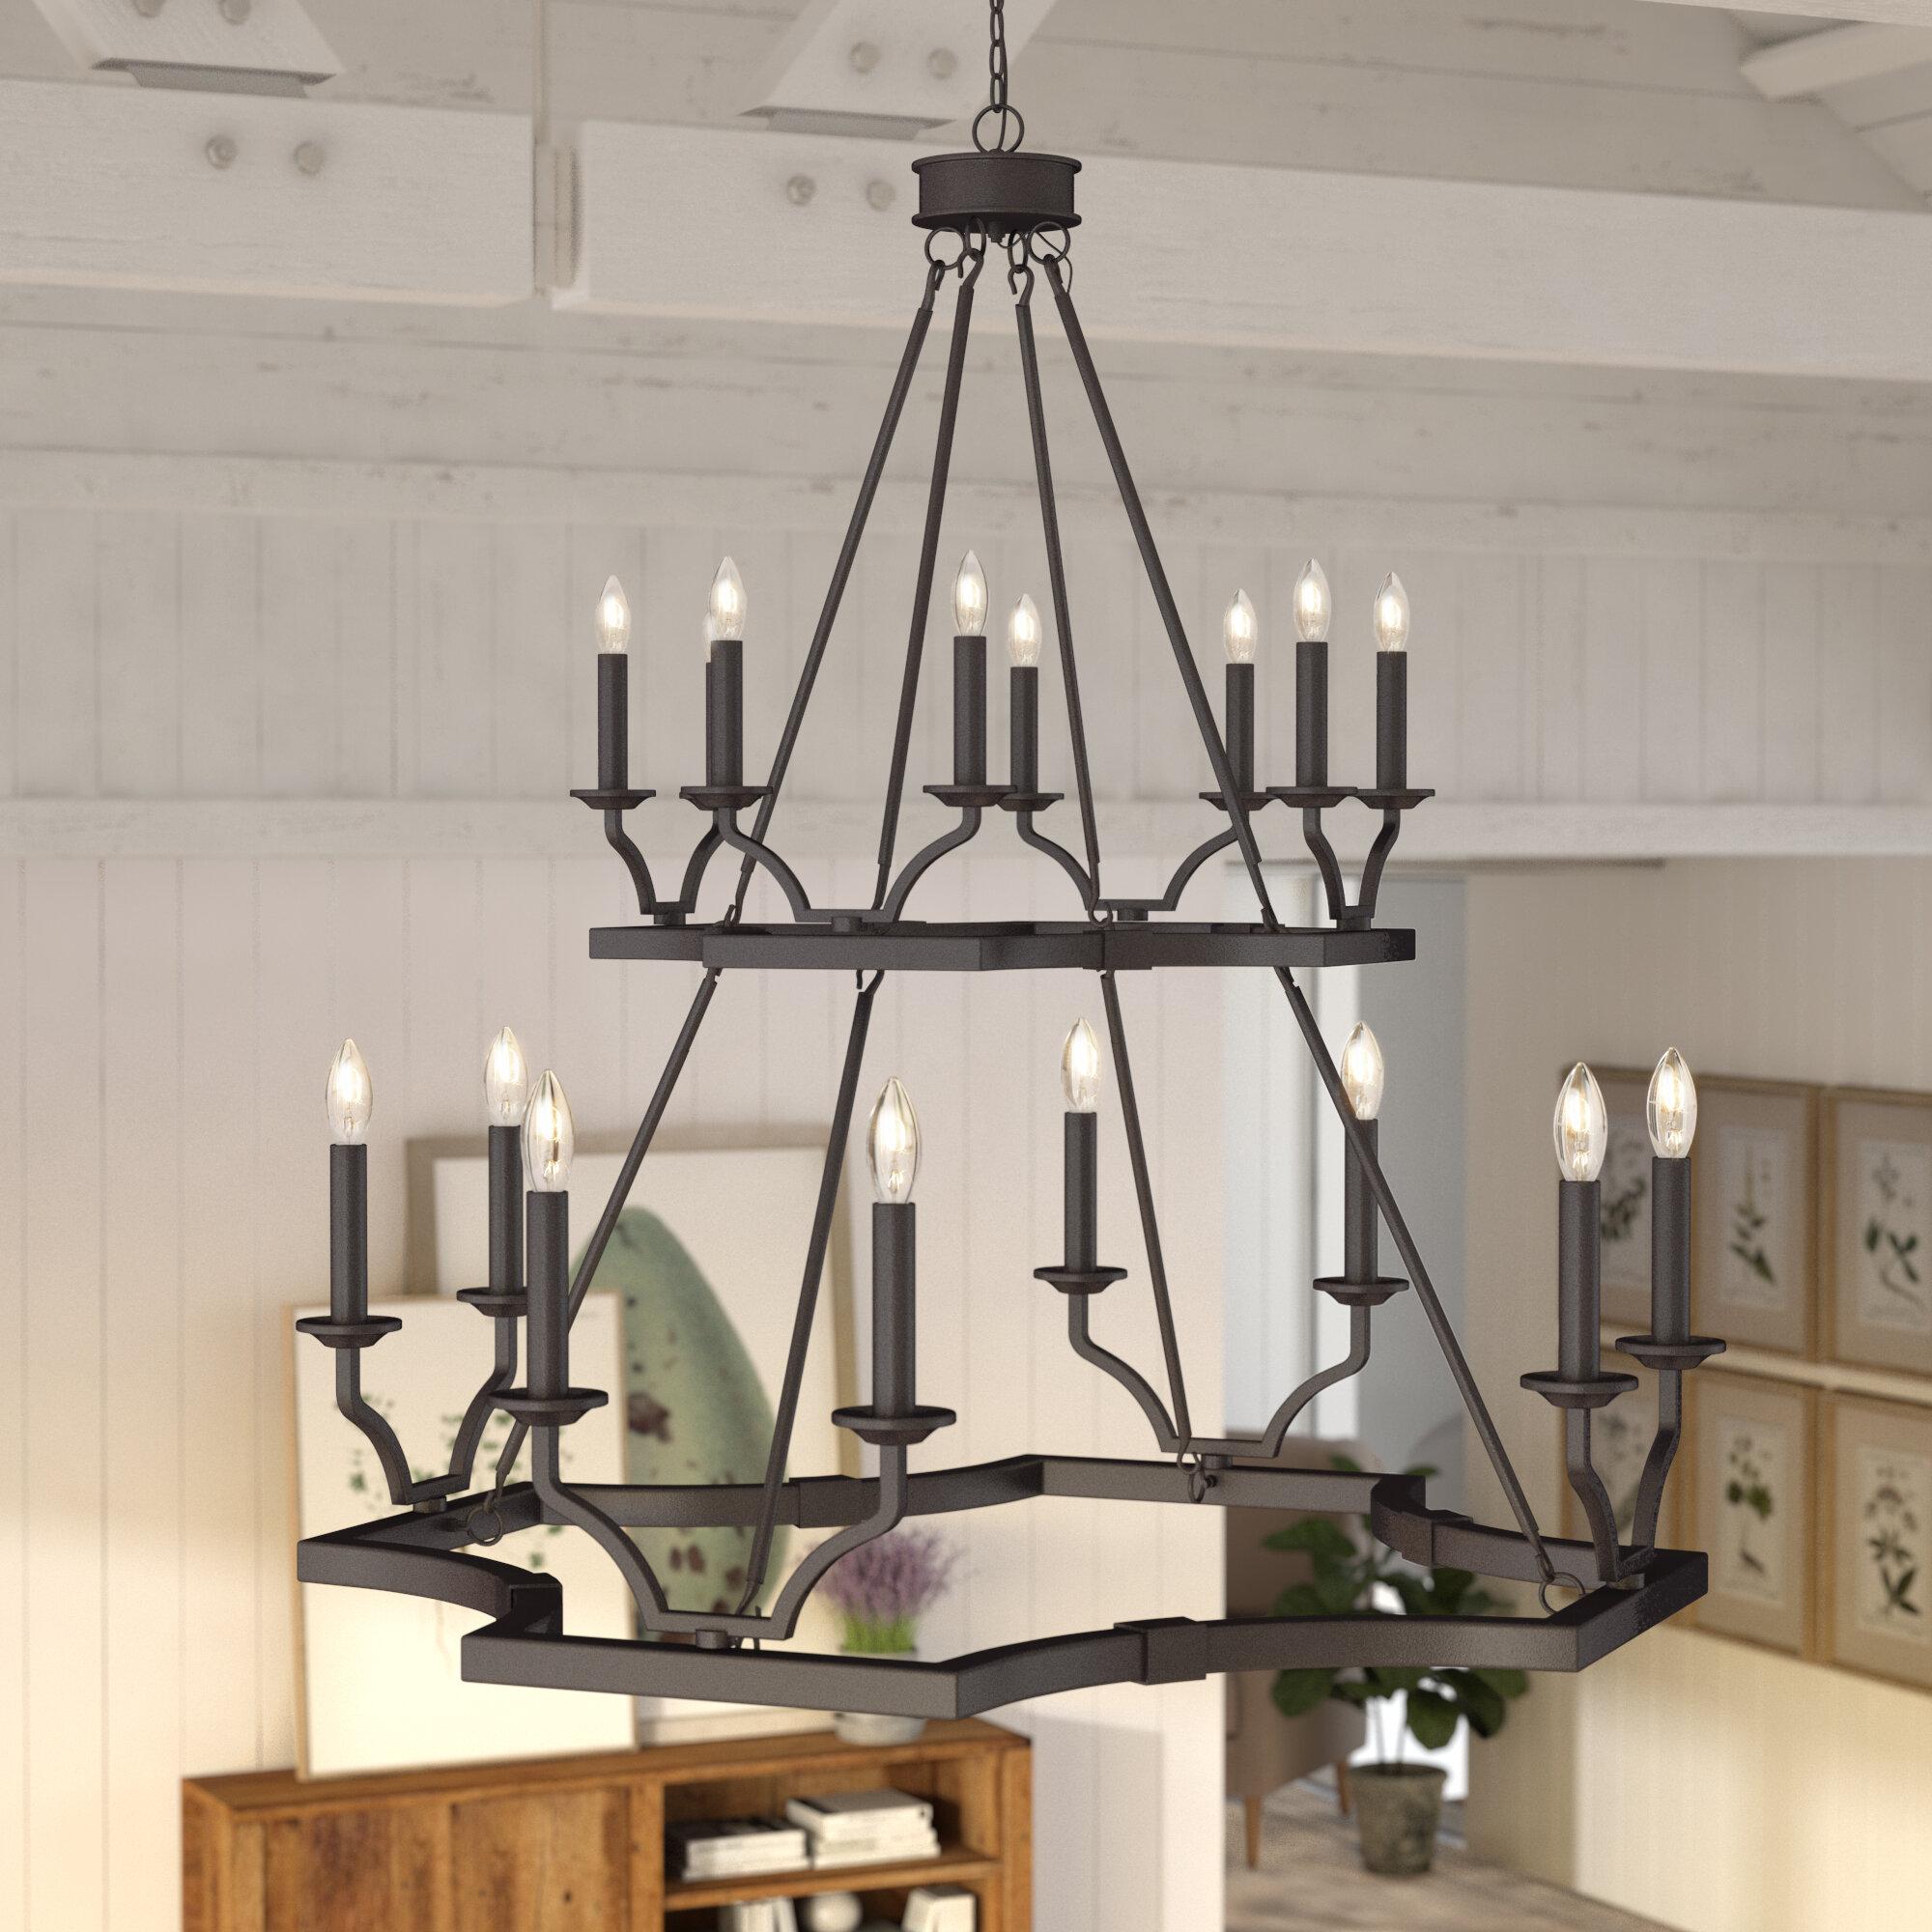 Union rustic mcdowell 16 light chandelier reviews wayfair aloadofball Images